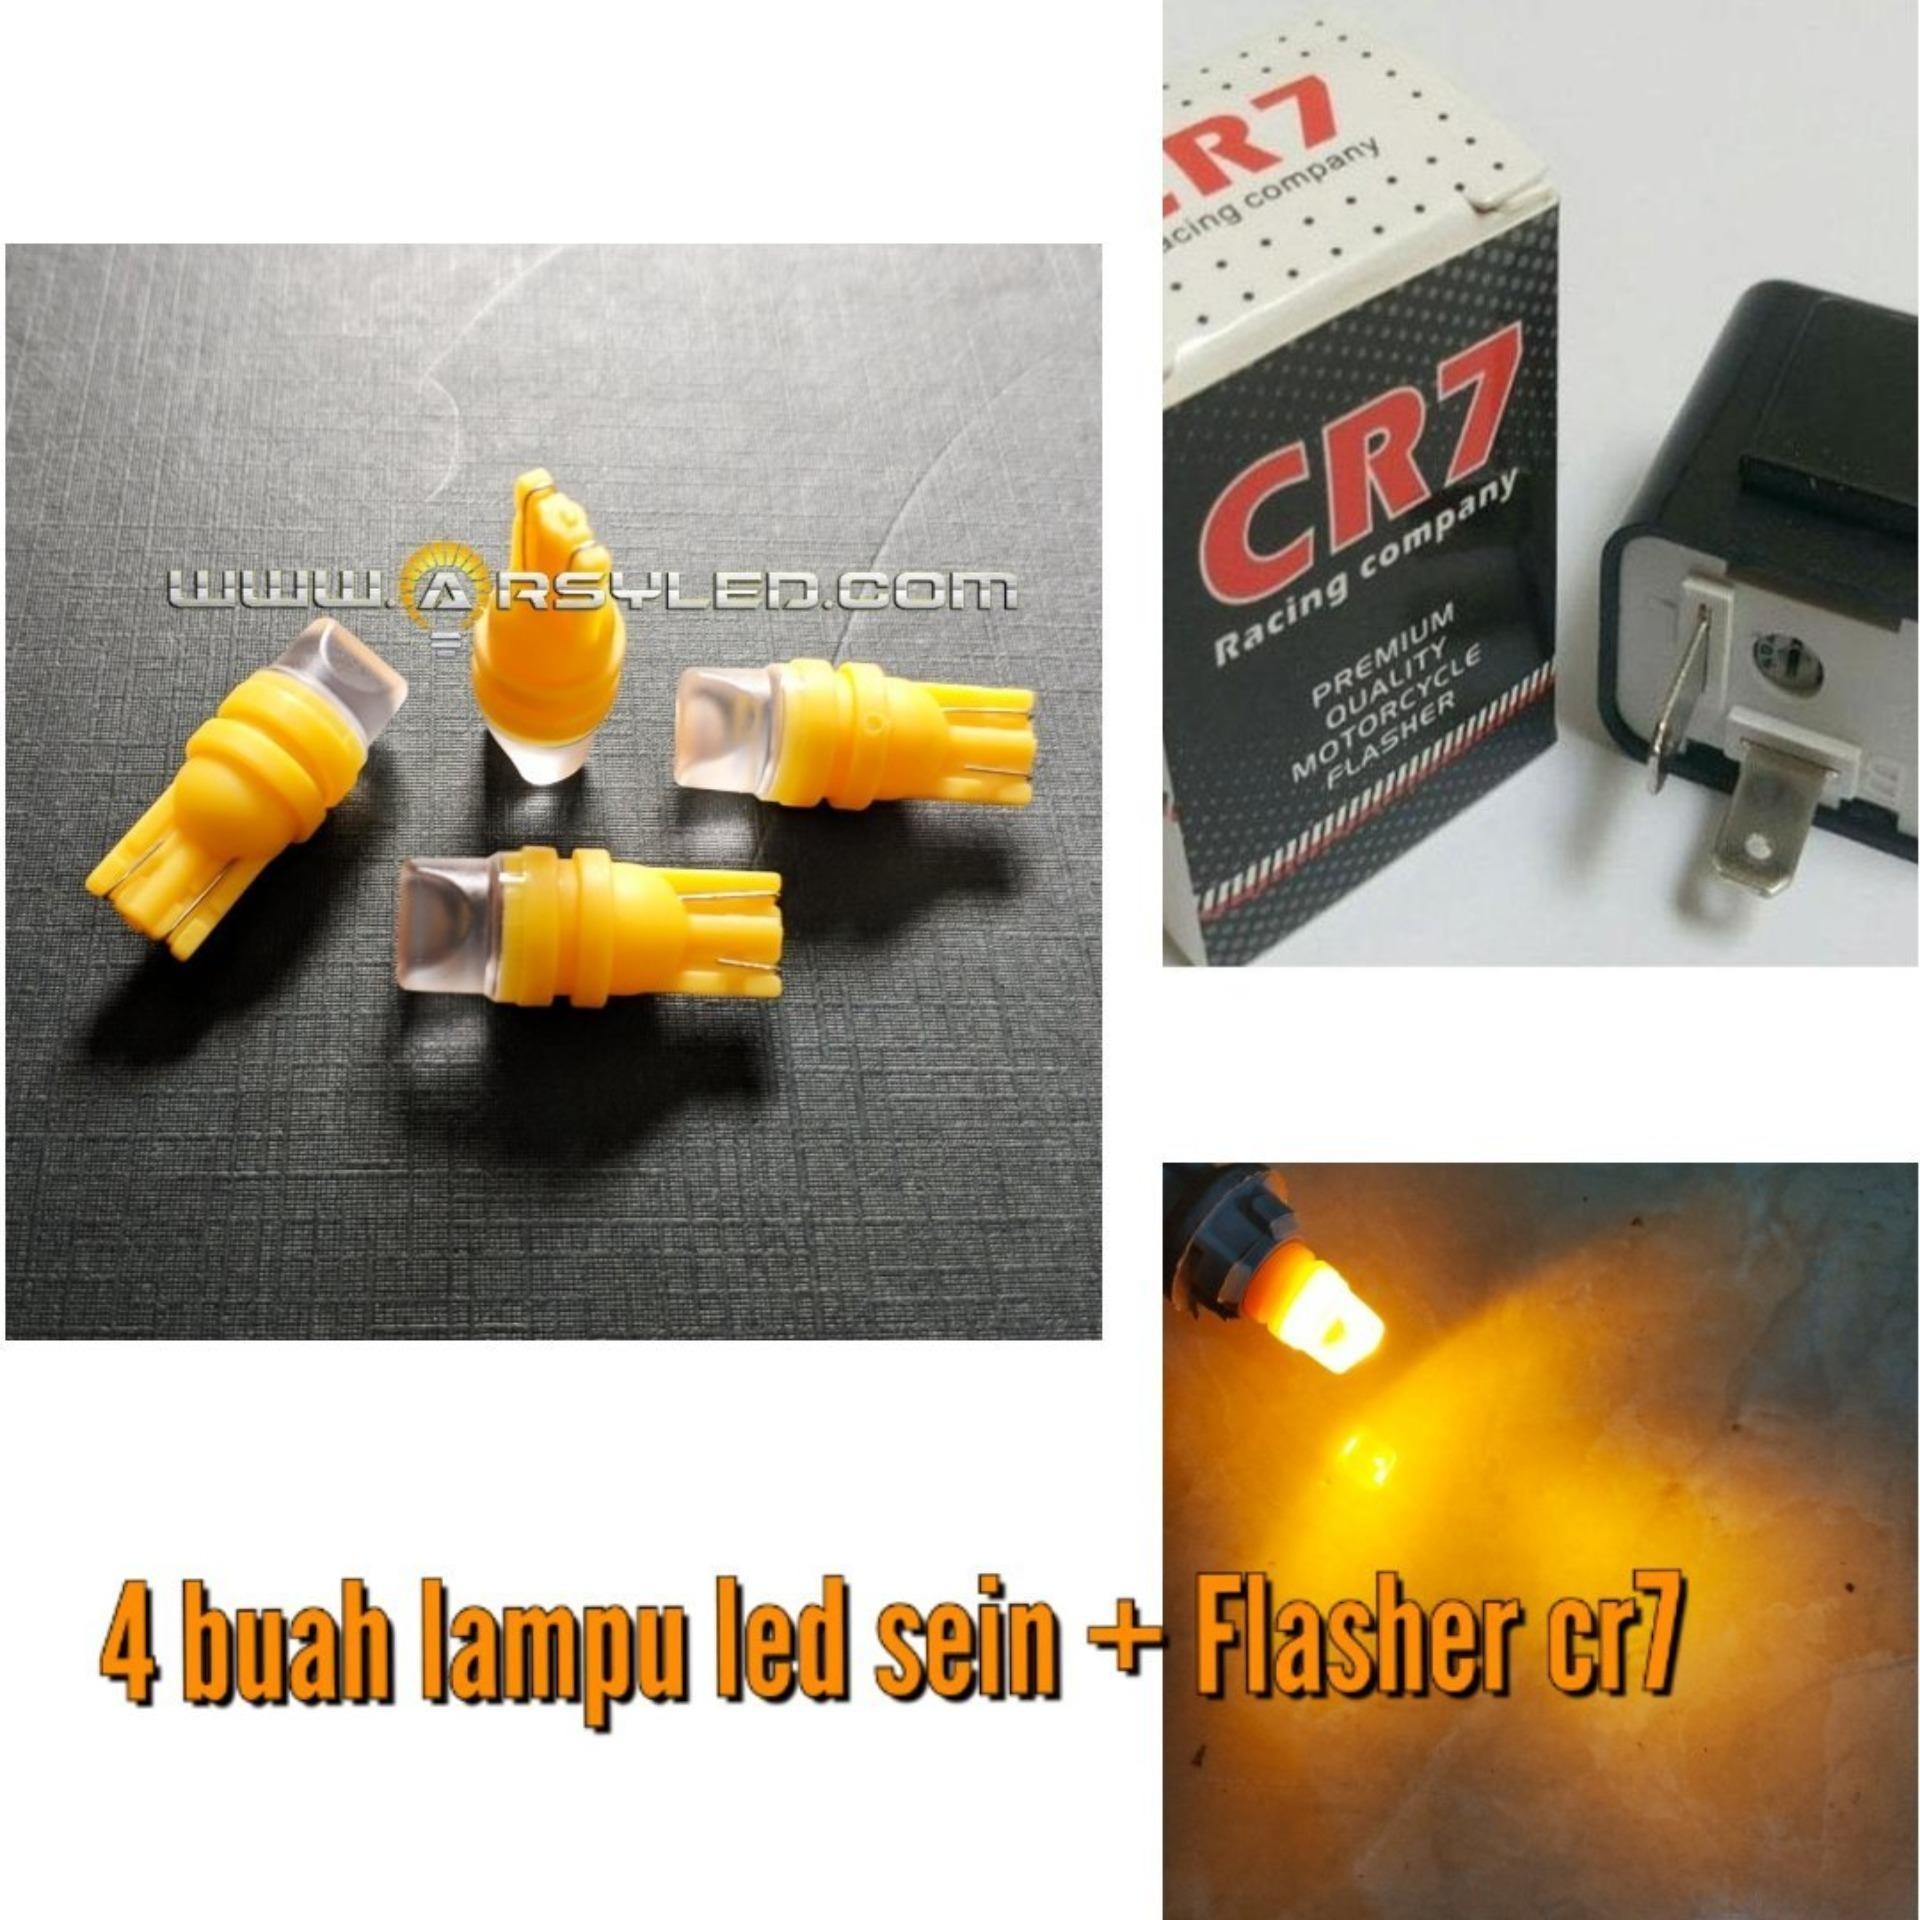 PAKET 4 BIJI Lampu SEIN SEN T10 + Flasher CR7 LED COSMO 3D lens Premium Grade A Super Bright Motor ARSYSTORE - KUNING